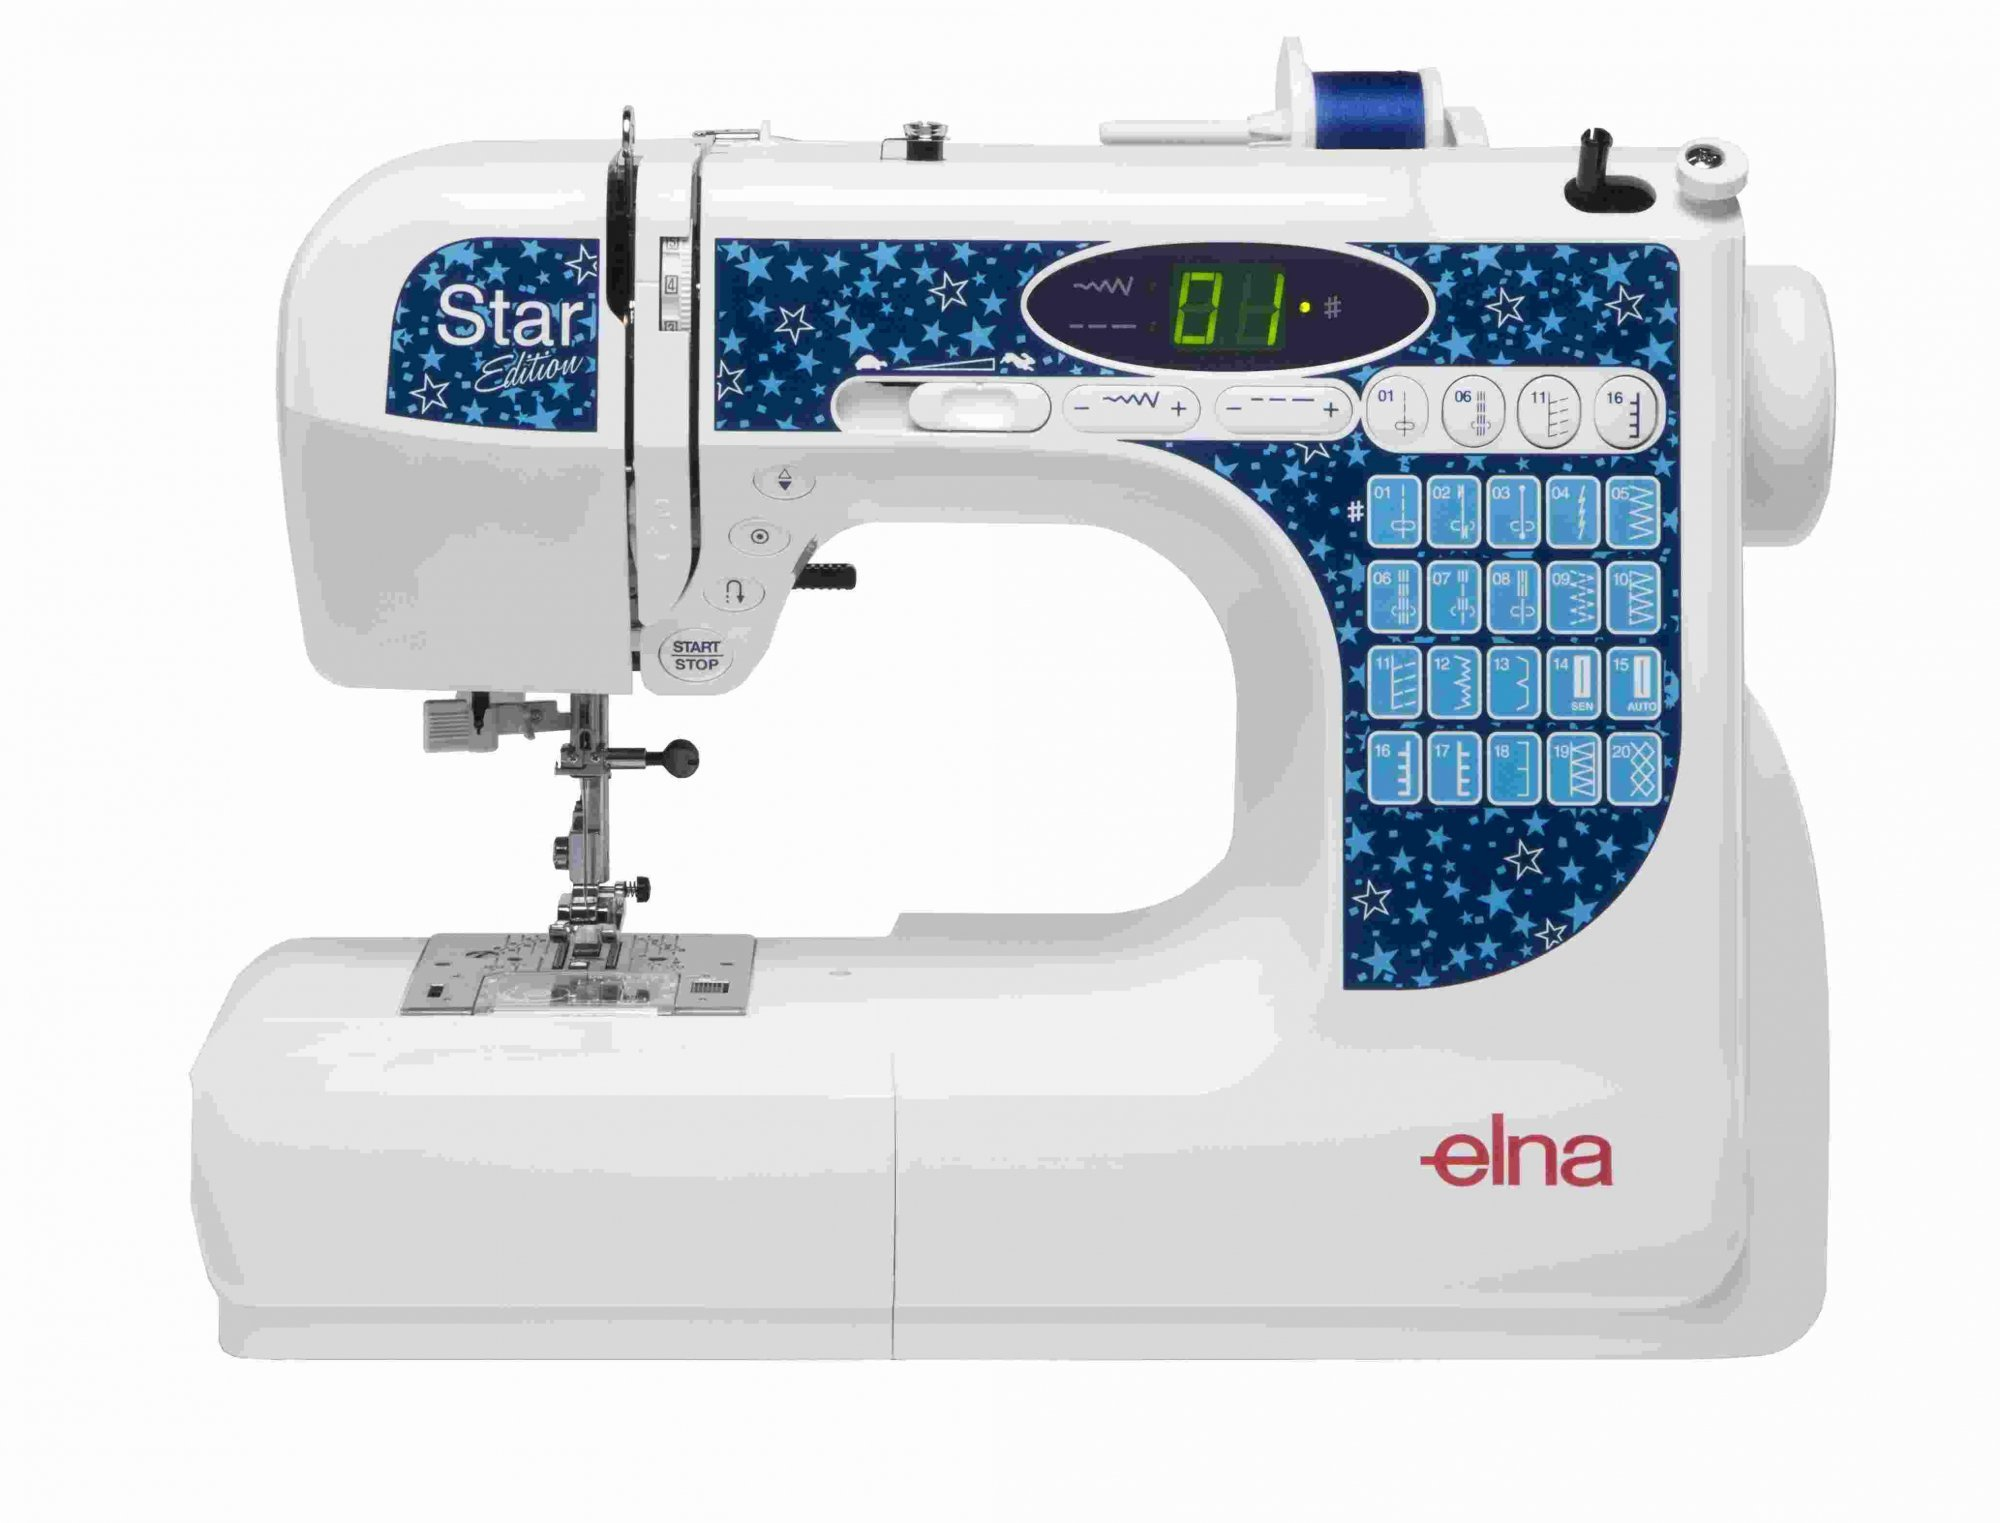 Elna Star Edition Sewing Machine